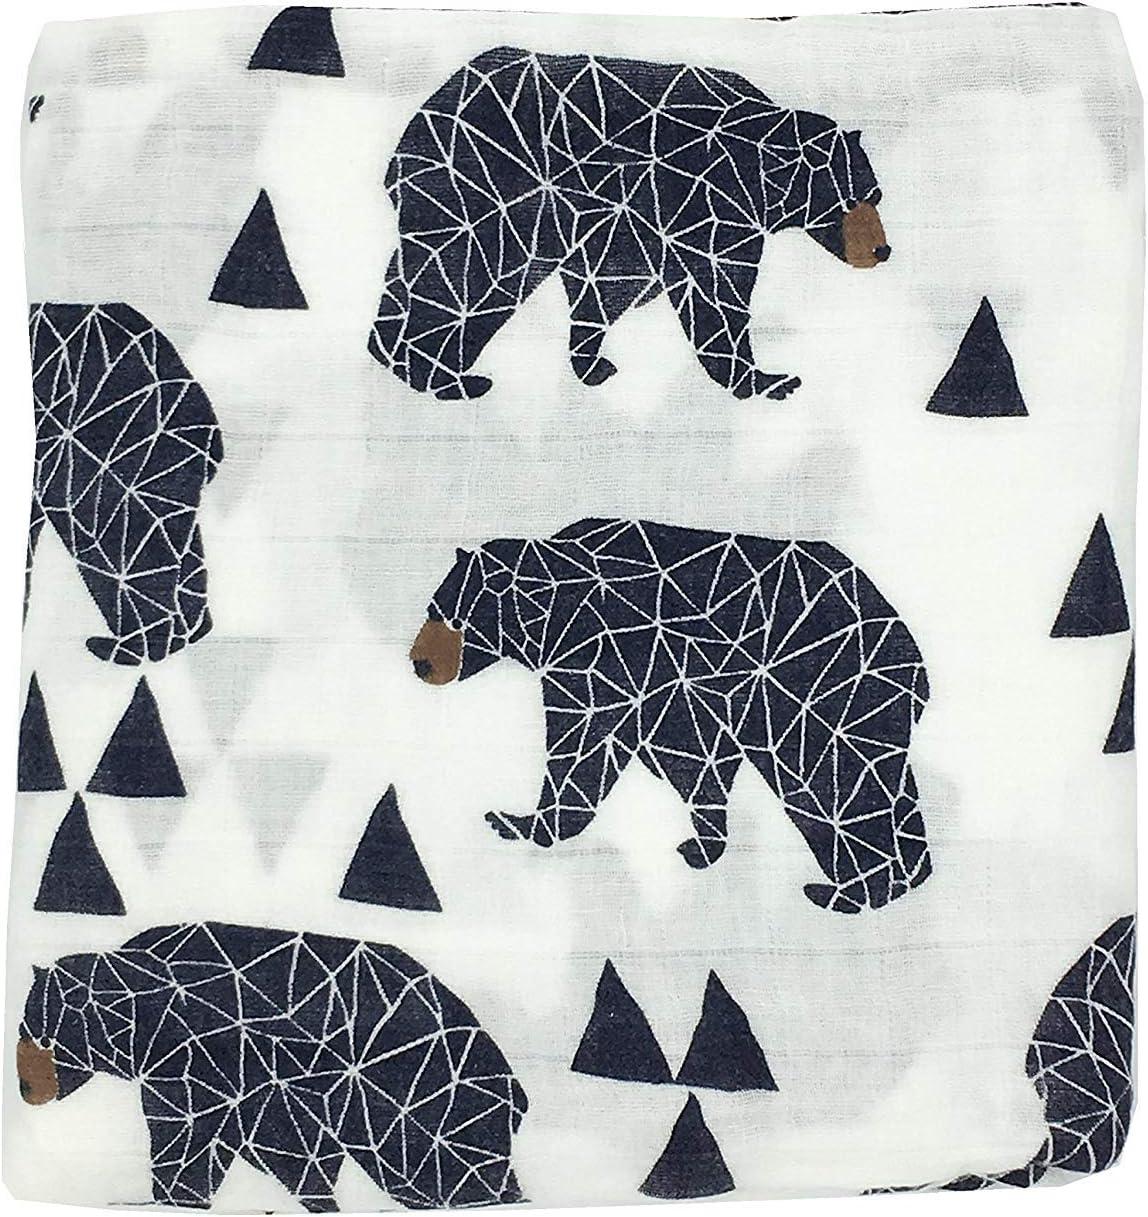 "HGHG Cute Bamboo Cotton Muslin Swaddle Blankets Premium Receiving Blanket for Boys & Girls 47"" x 47"" Baby Bear Blanket"